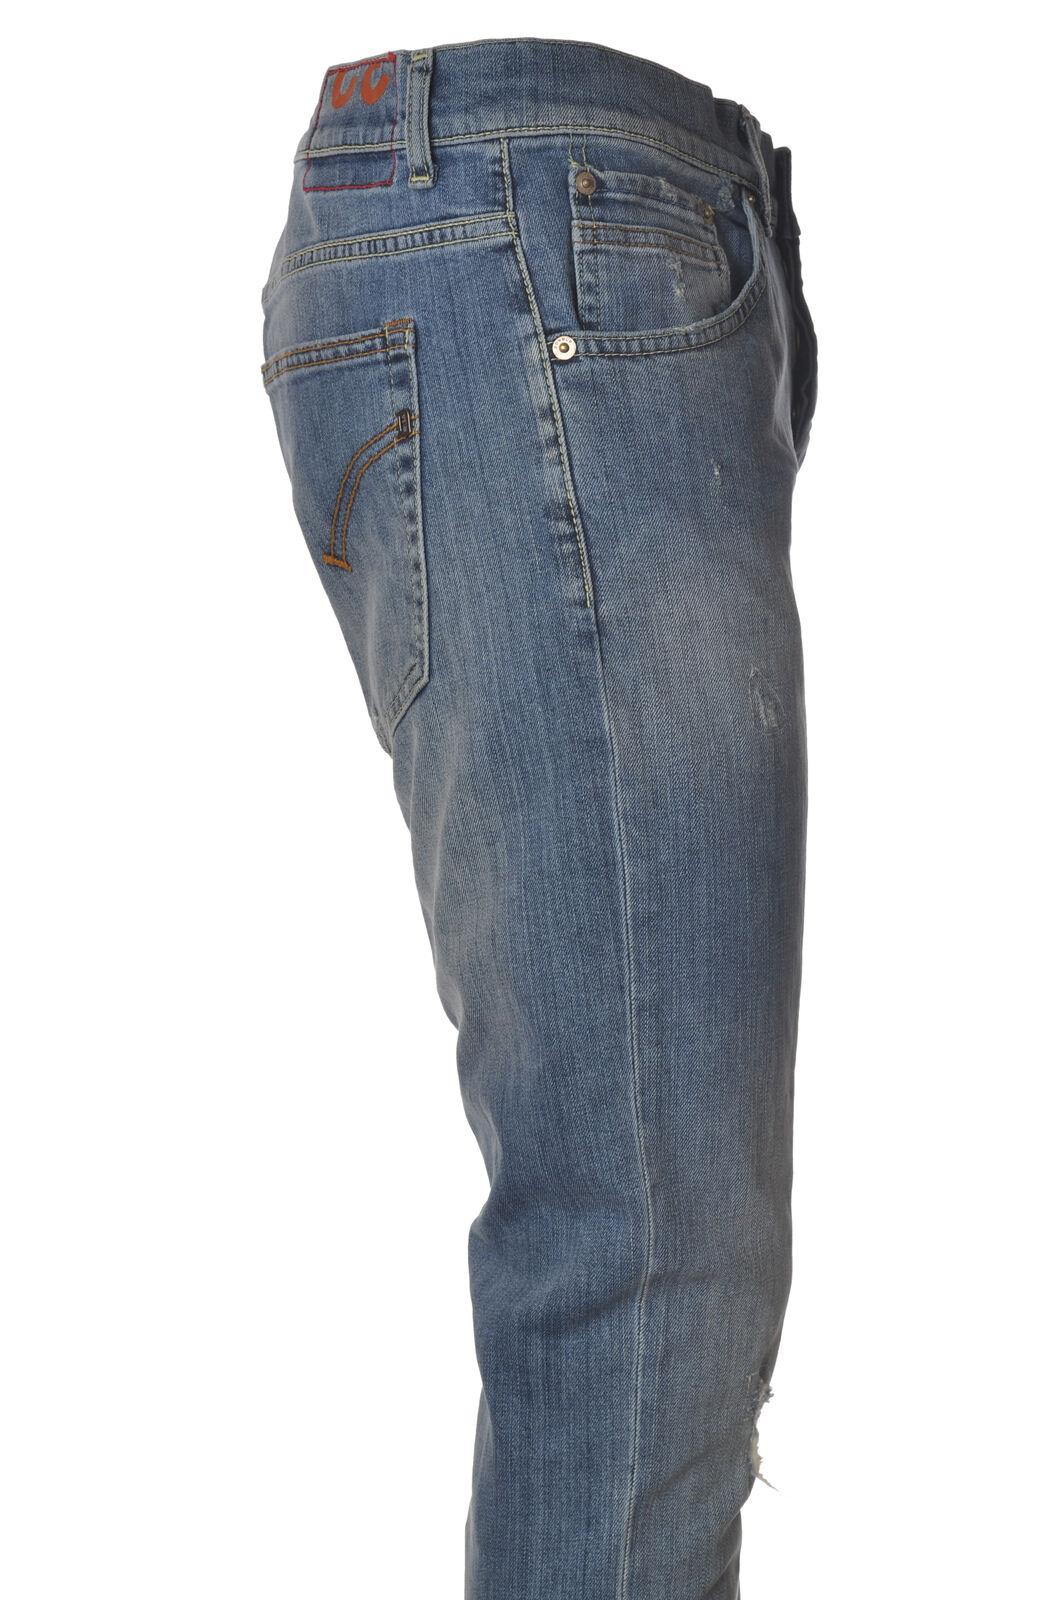 Dondup - Jeans-Pants-slim fit - Man - Denim - 5927409C192153